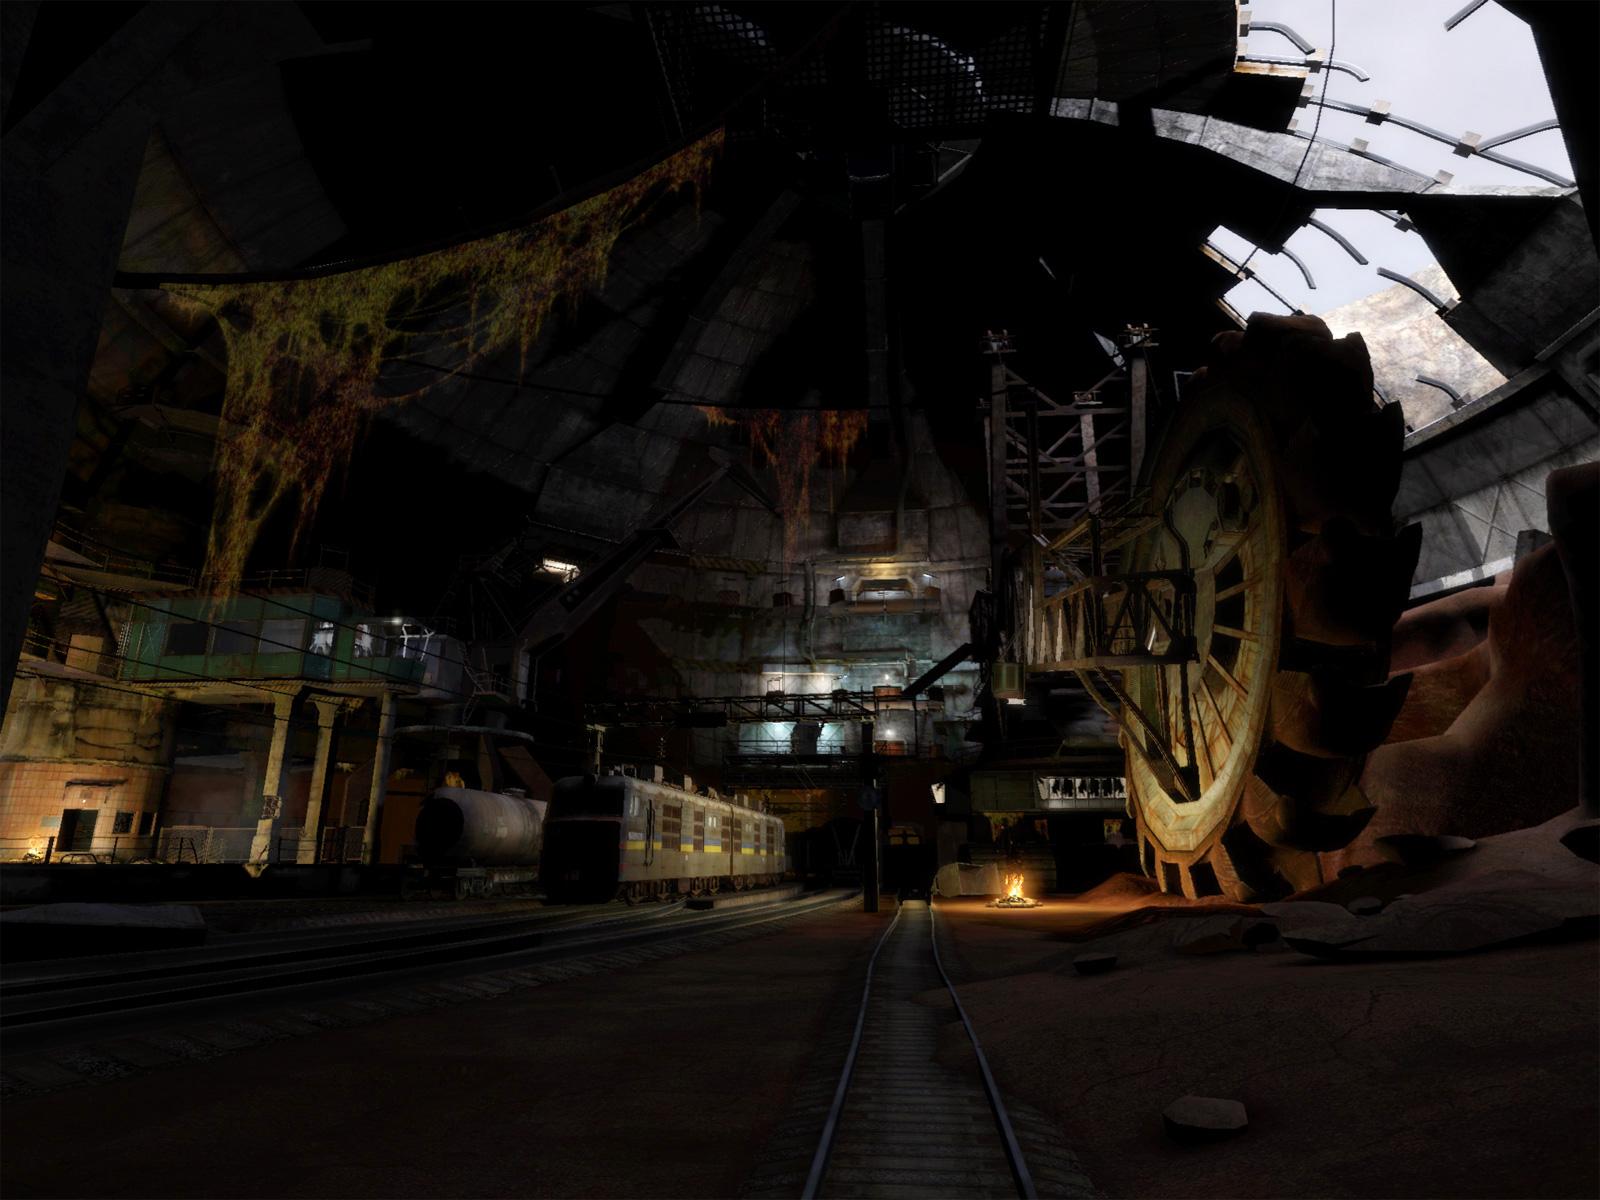 Pripyat Underground Clear Sky S T A L K E R Wiki Fandom